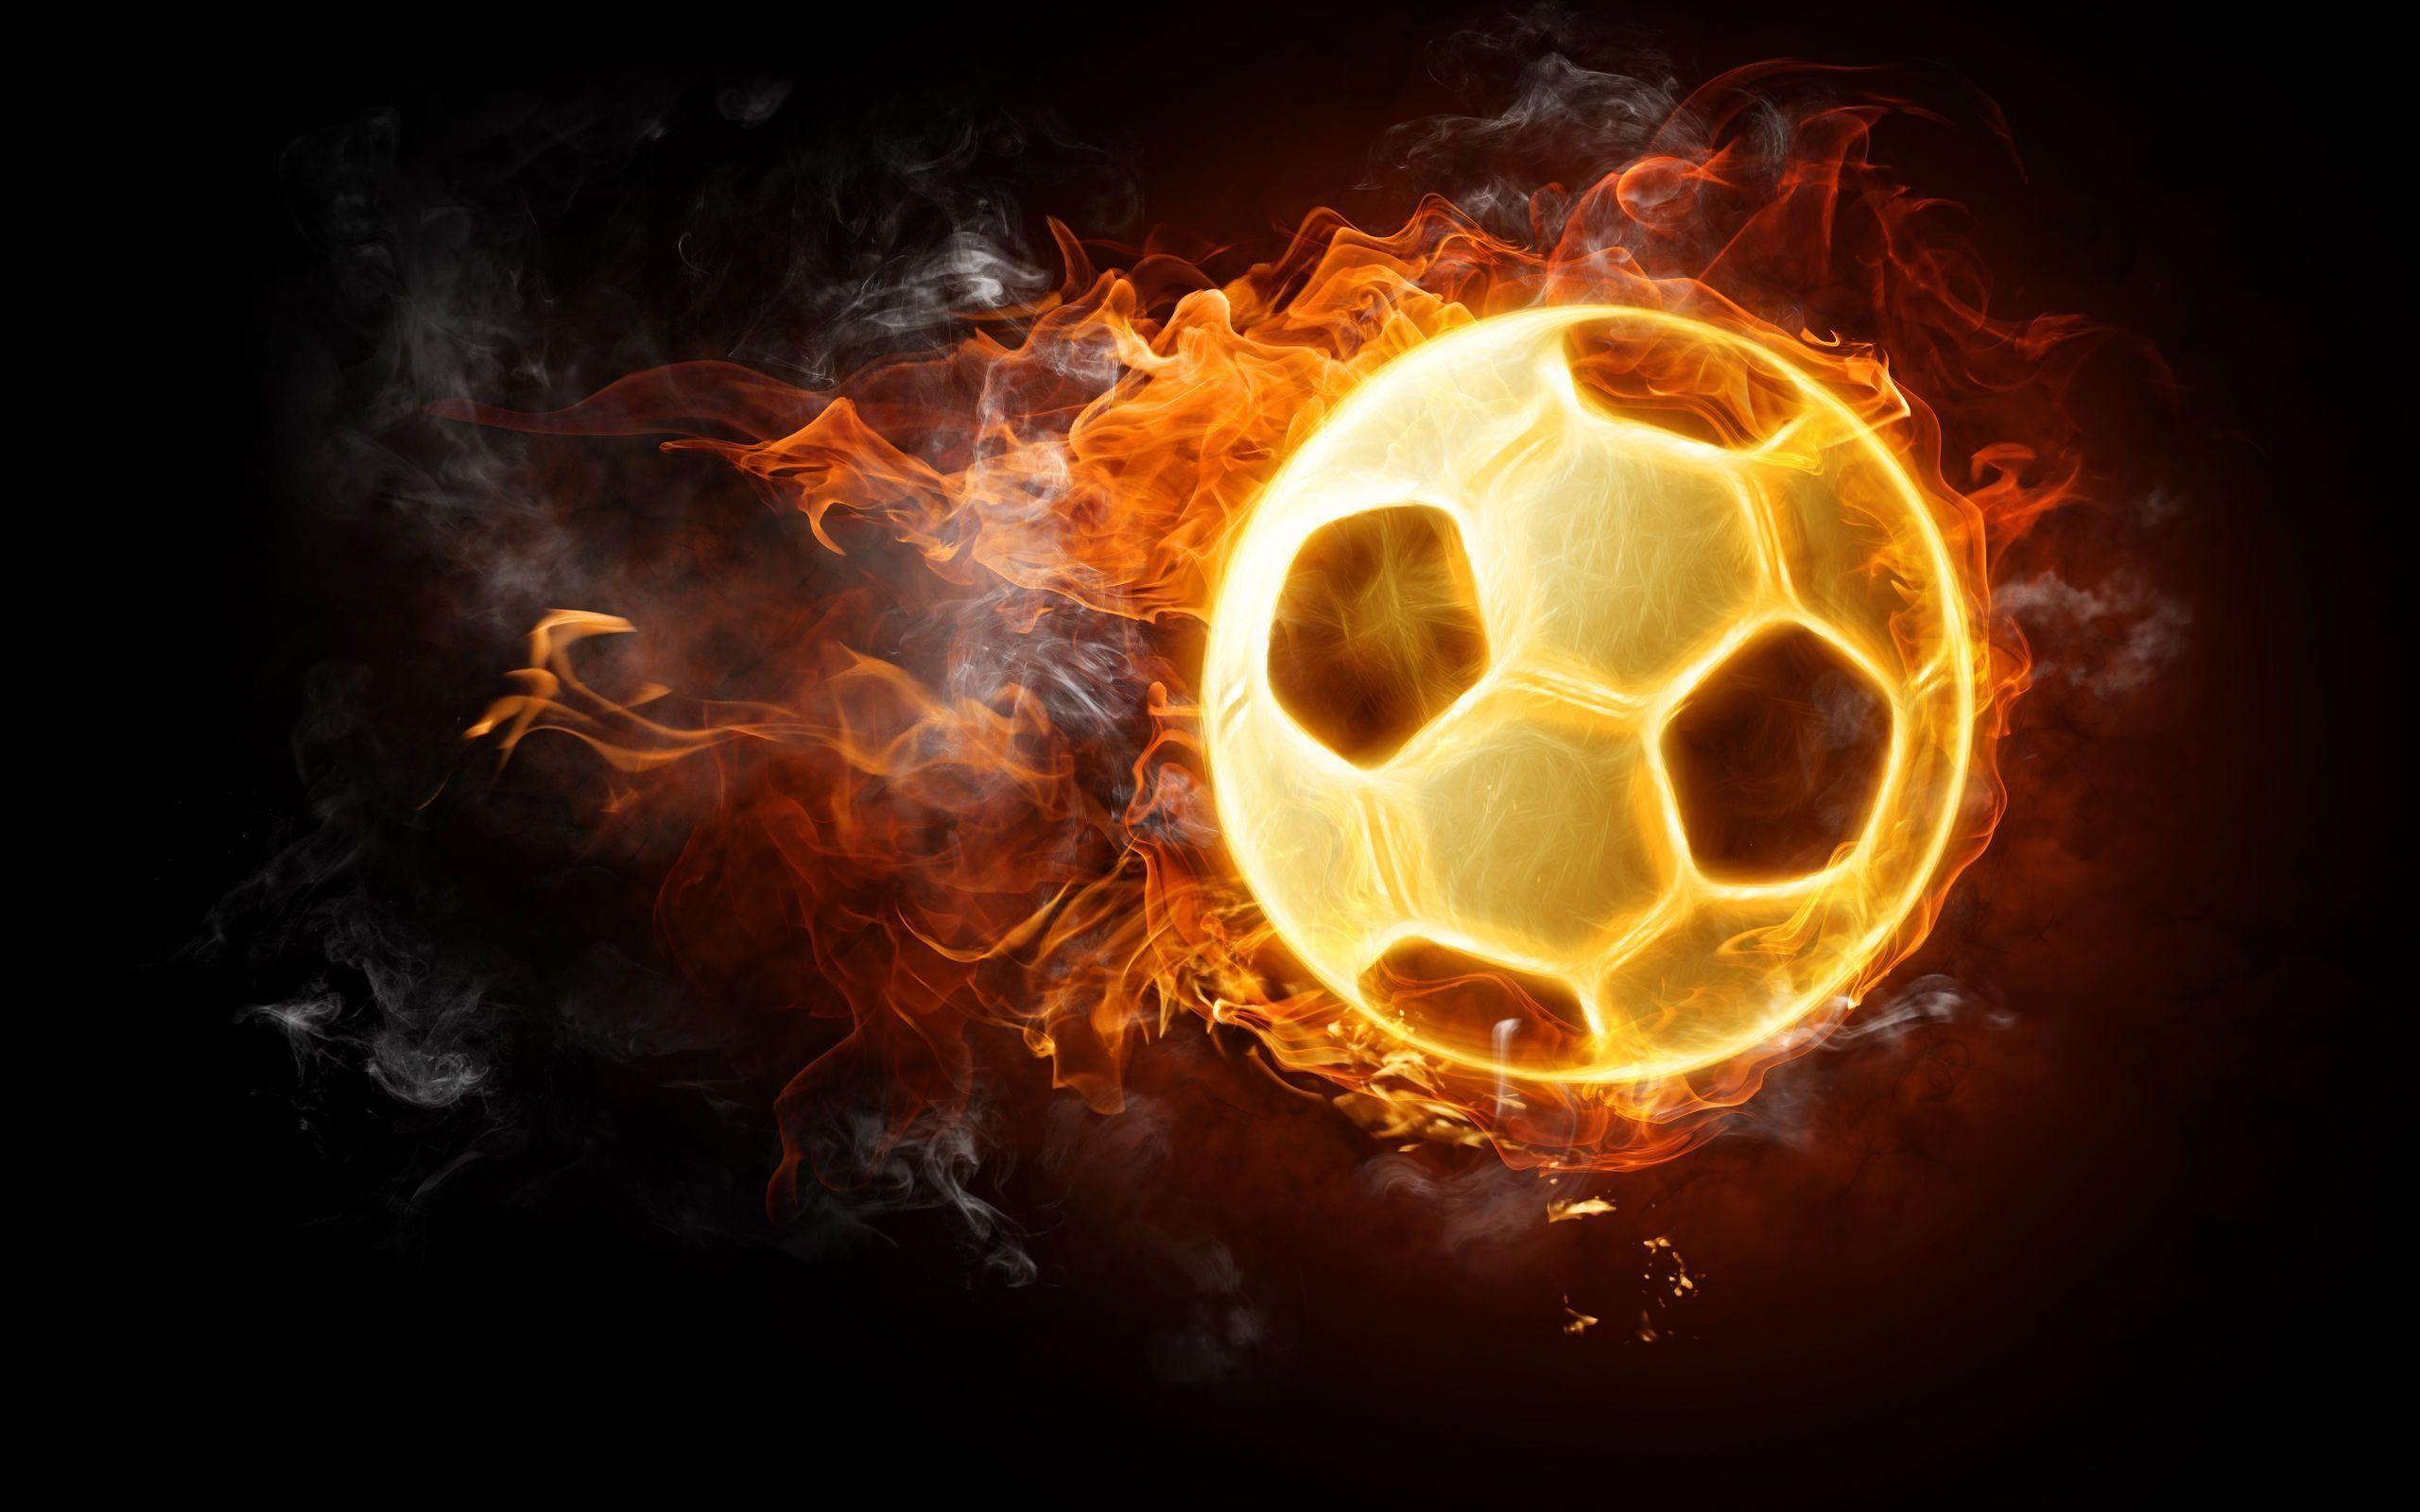 Cool soccer ball wallpaper 63 images 2560x1600 cool soccer ball wallpaper for desktop background 13 hd wallpapers voltagebd Images